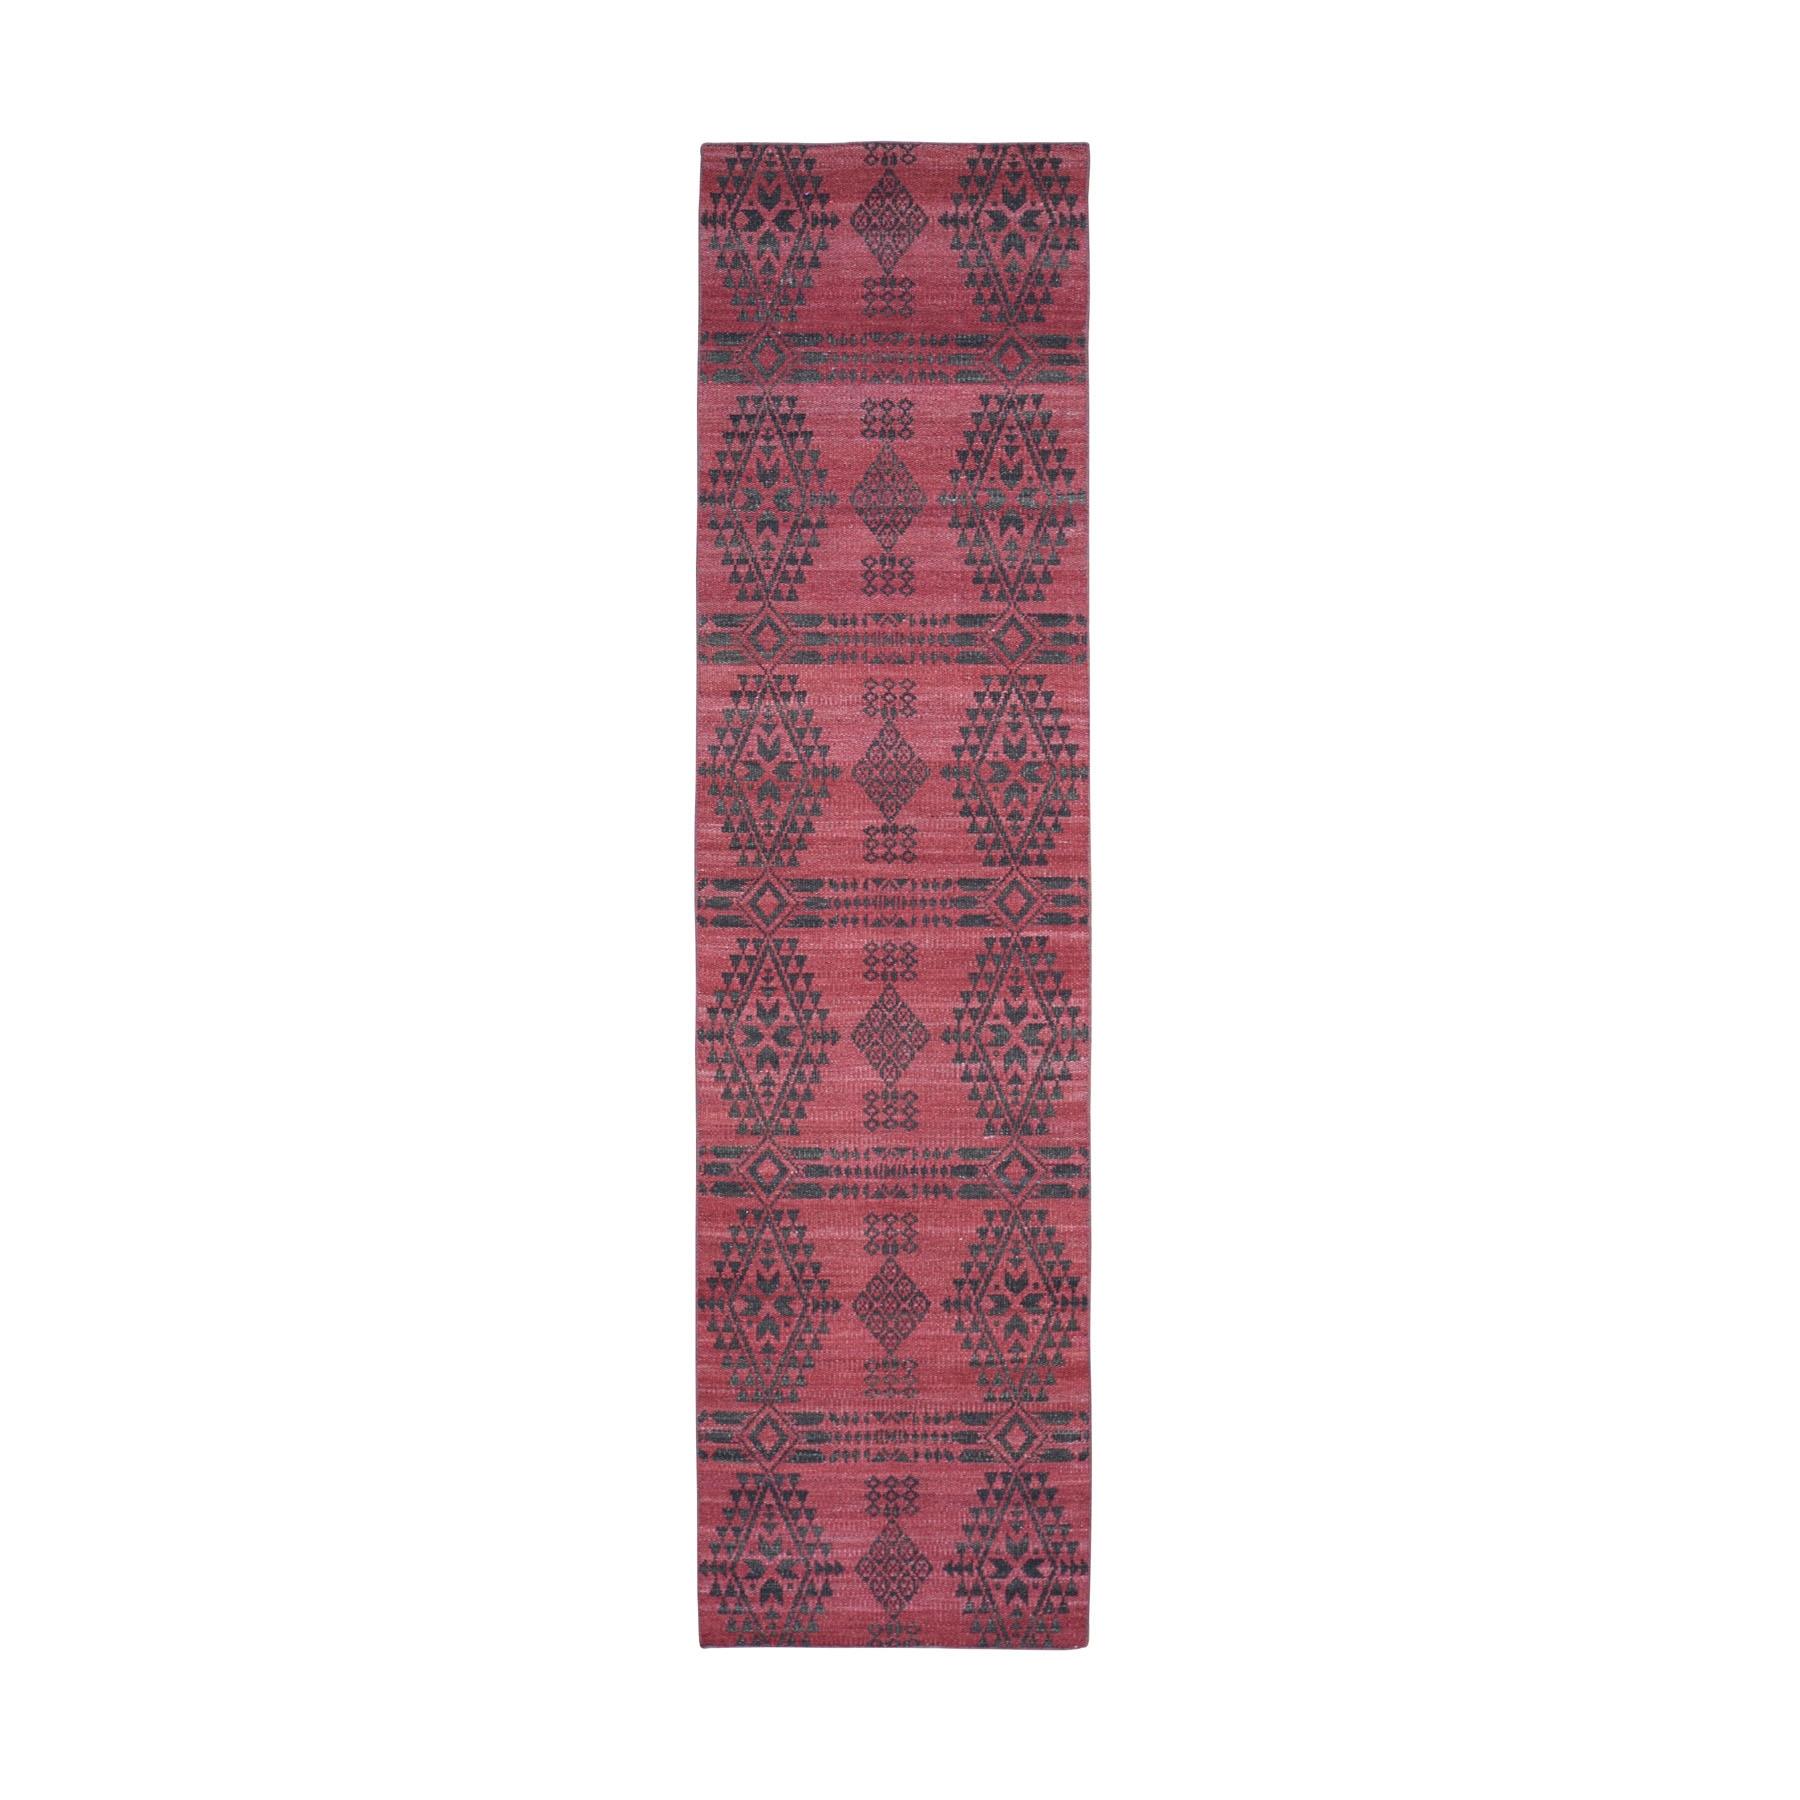 "2'6""x9'10""  Hand Woven Flat Weave Pure Wool Reversible Kilim Runner Oriental Rug"